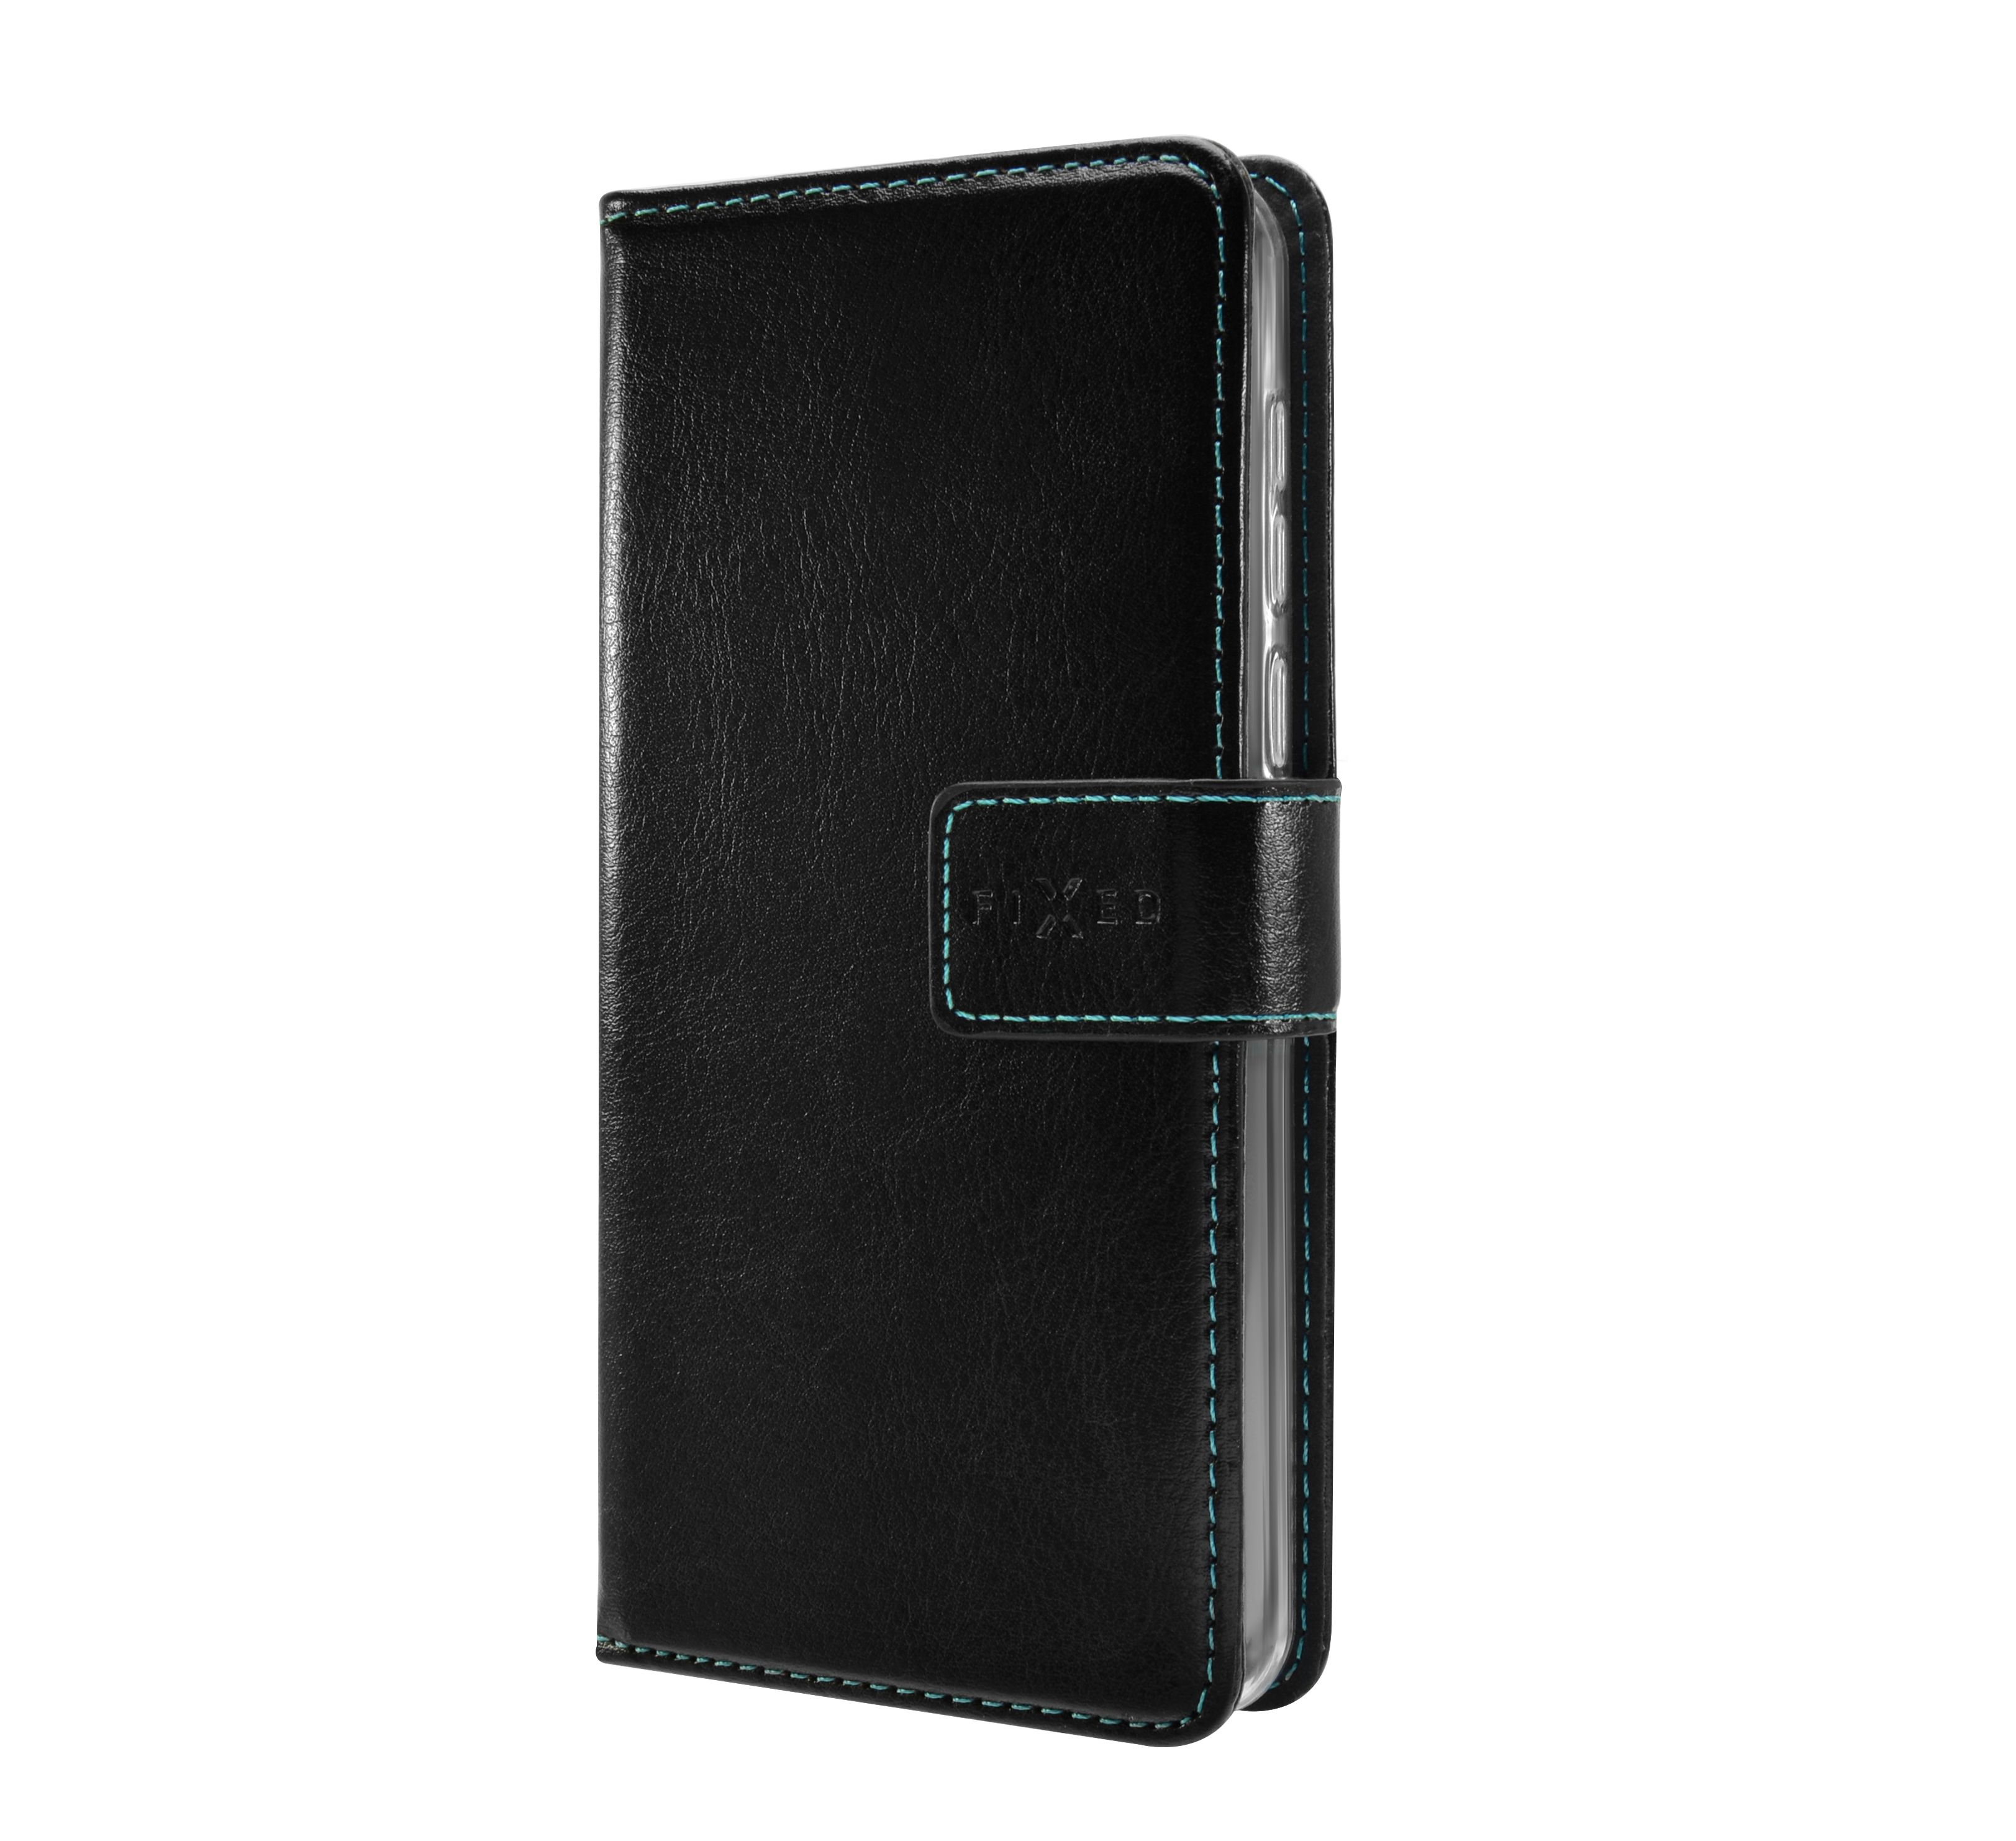 Pouzdro typu kniha FIXED Opus pro Huawei P40, černé